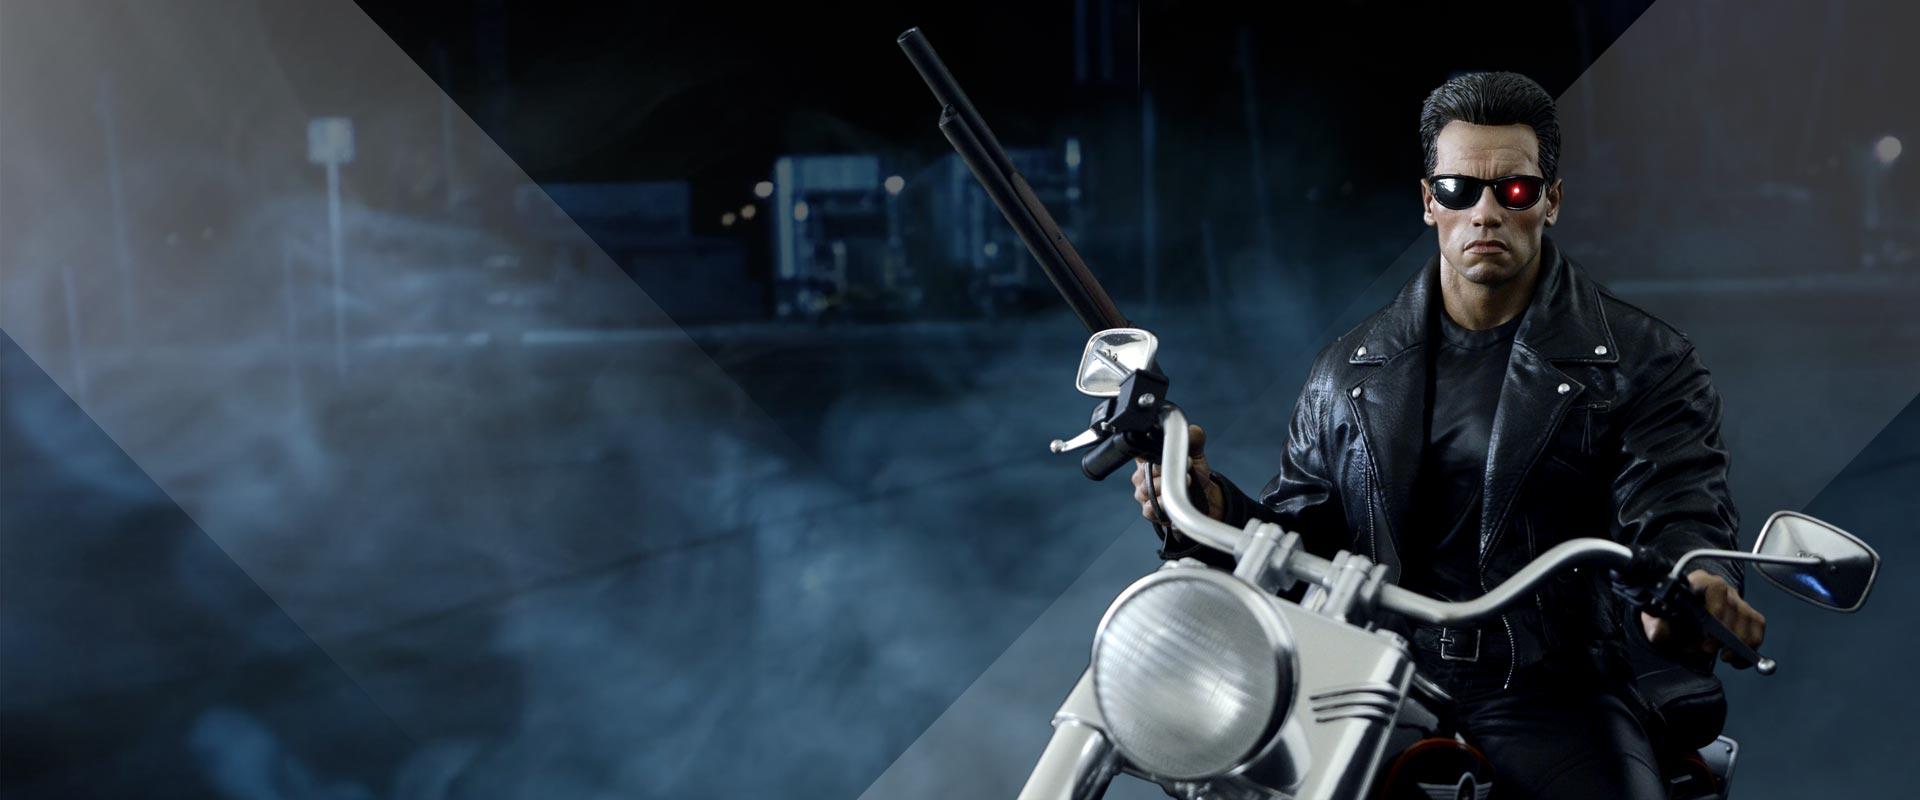 Terminator 2 on bike